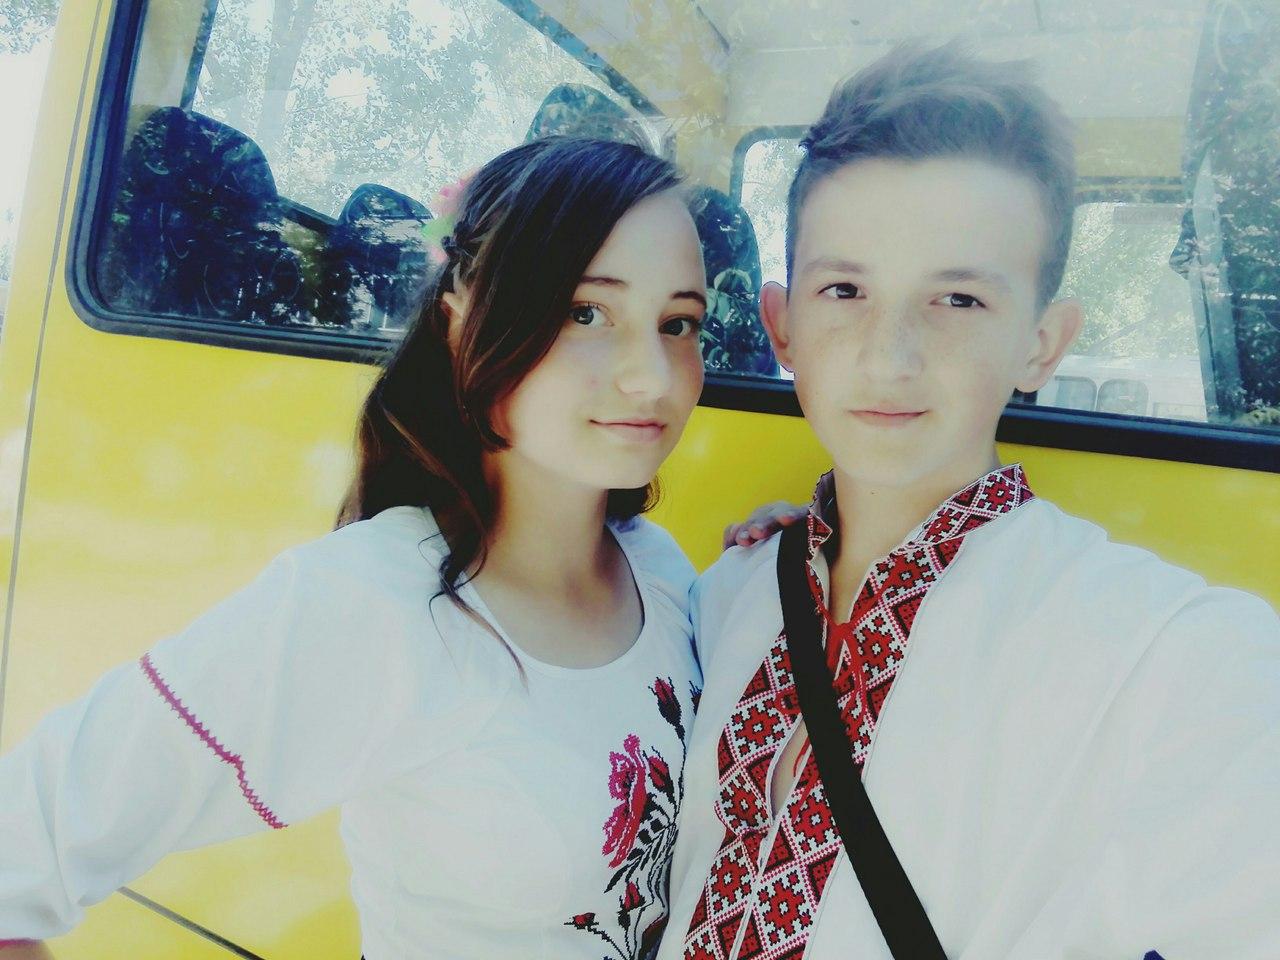 Дима Самойленко, Николаев - фото №4